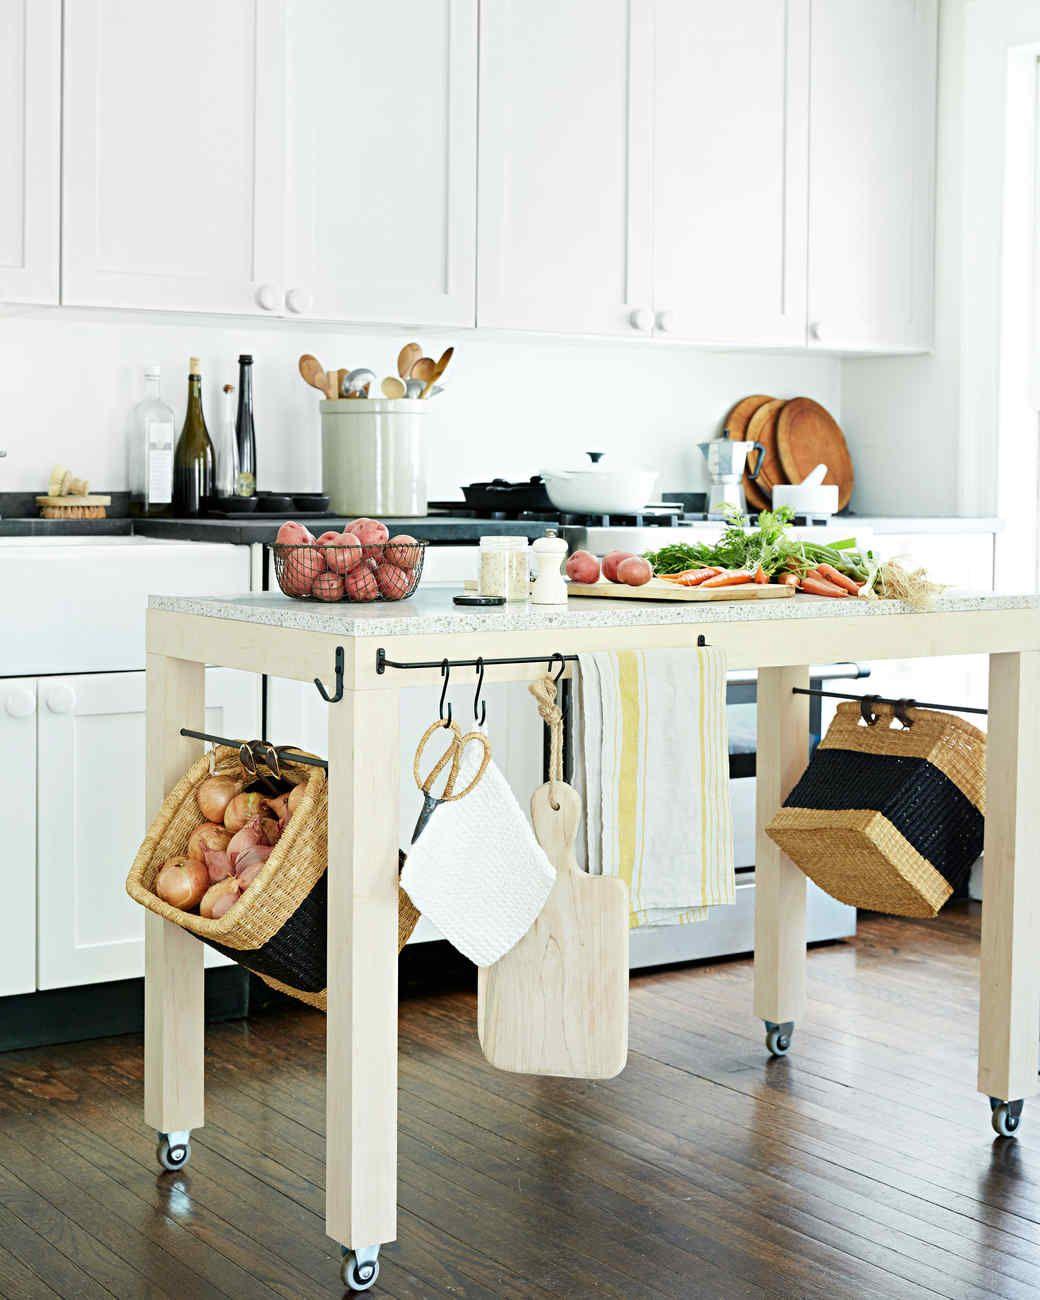 Floating Island Storage Apartment Kitchen Organization Studio